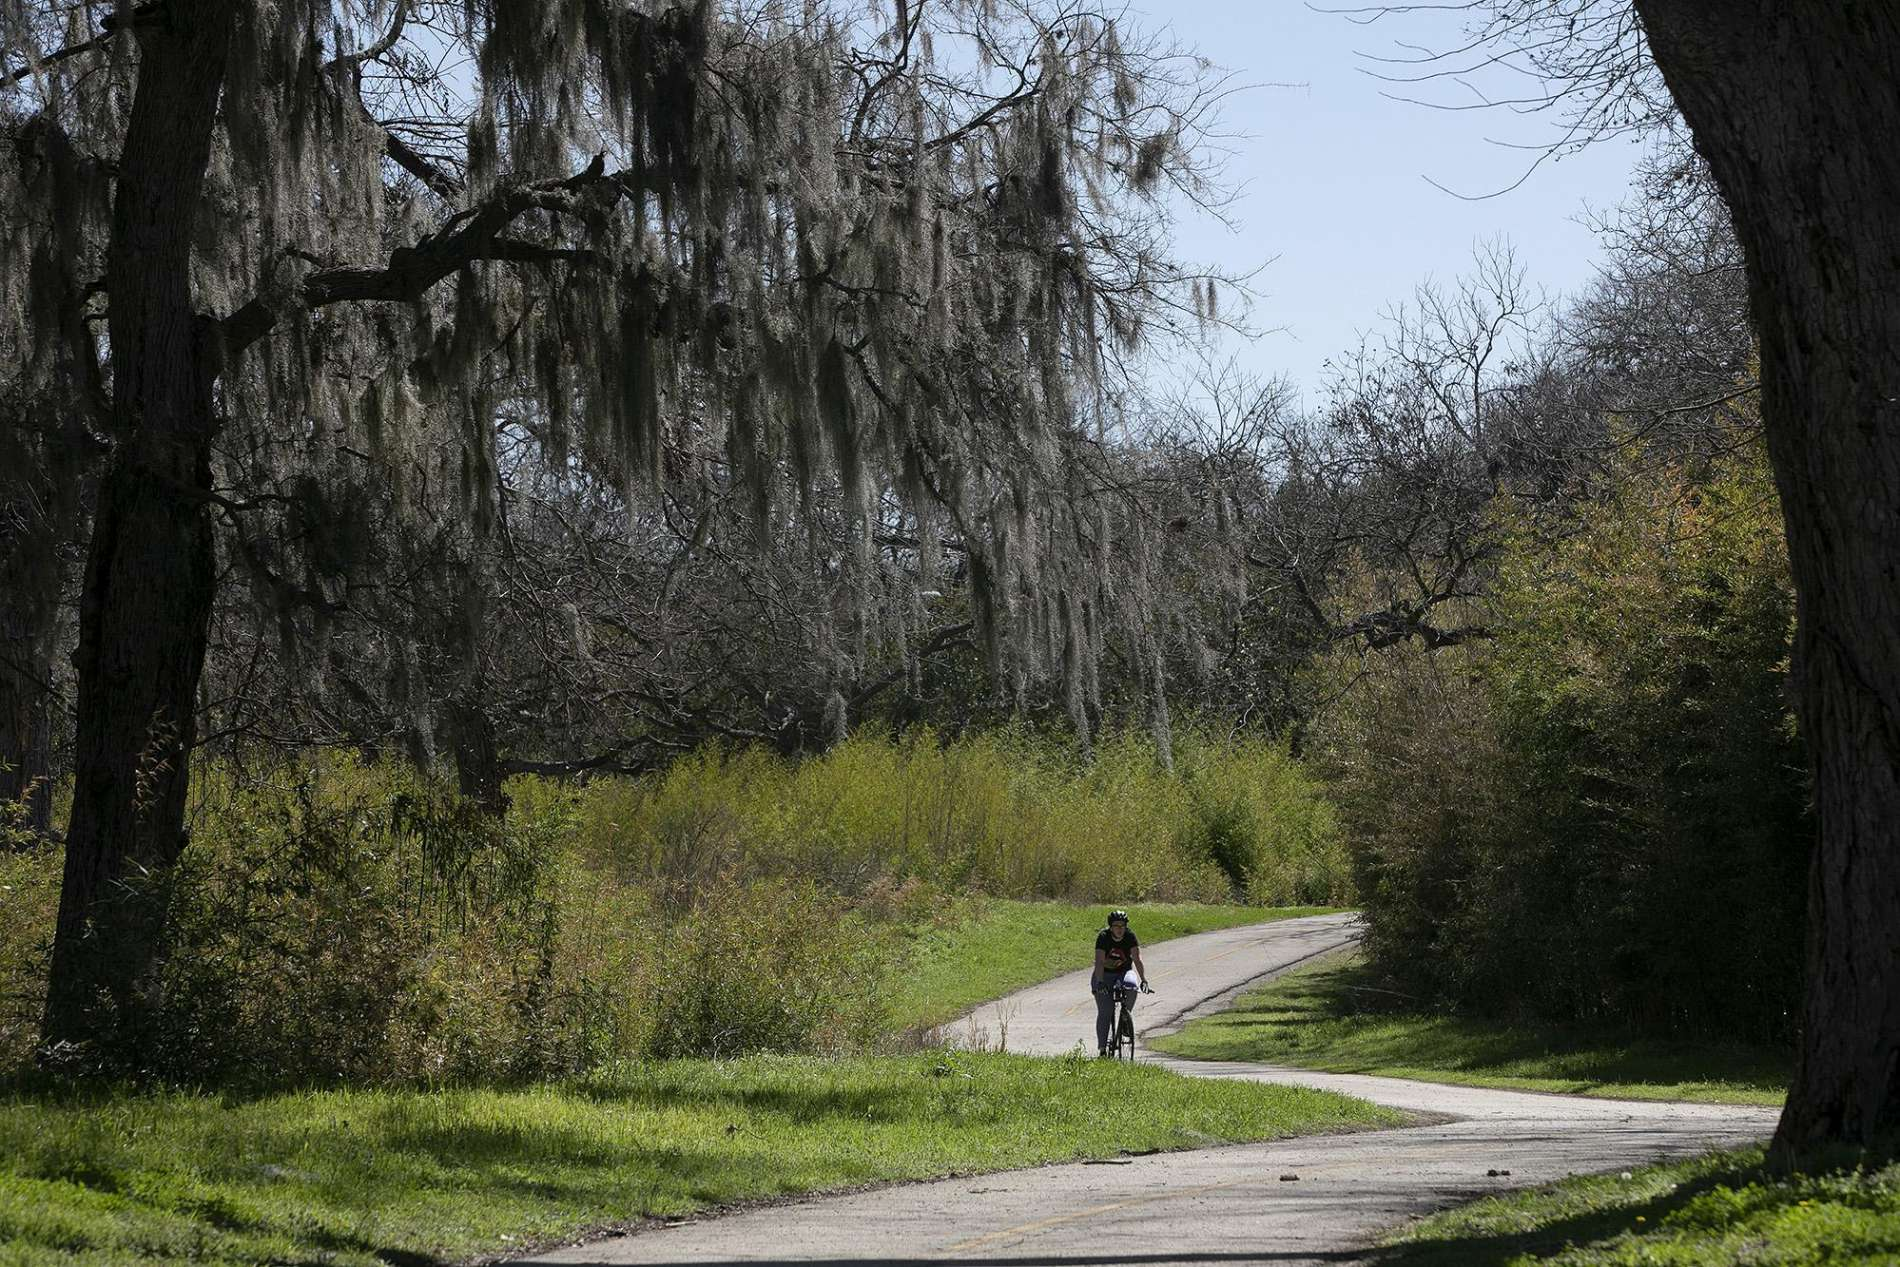 Cyclist Biking On A Path In The Salado Creek Greenway